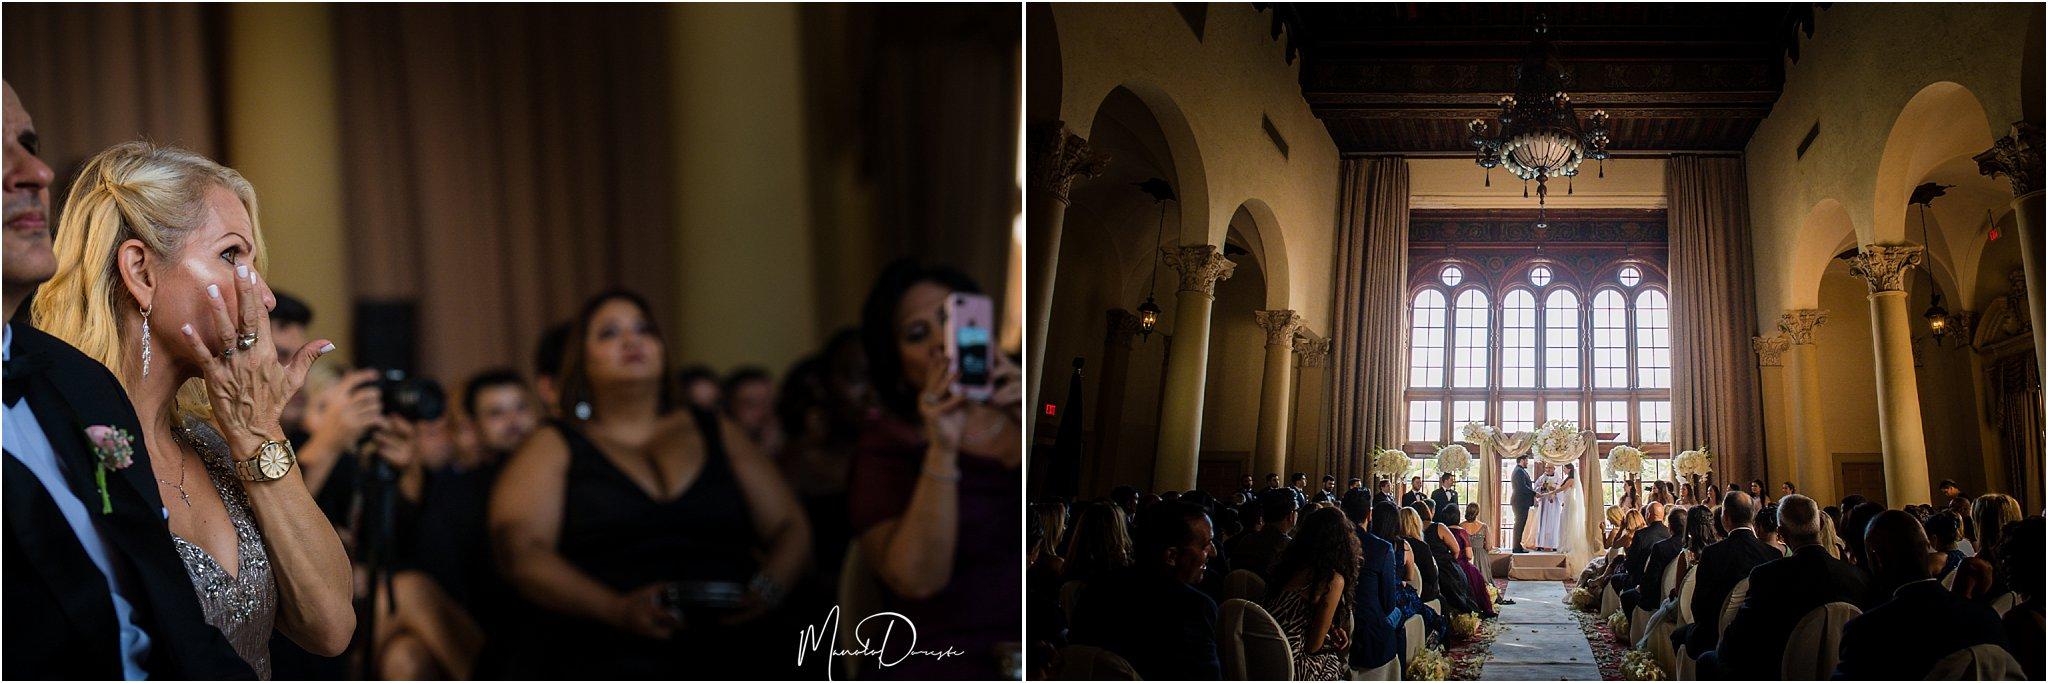 0165_ManoloDoreste_InFocusStudios_Wedding_Family_Photography_Miami_MiamiPhotographer.jpg